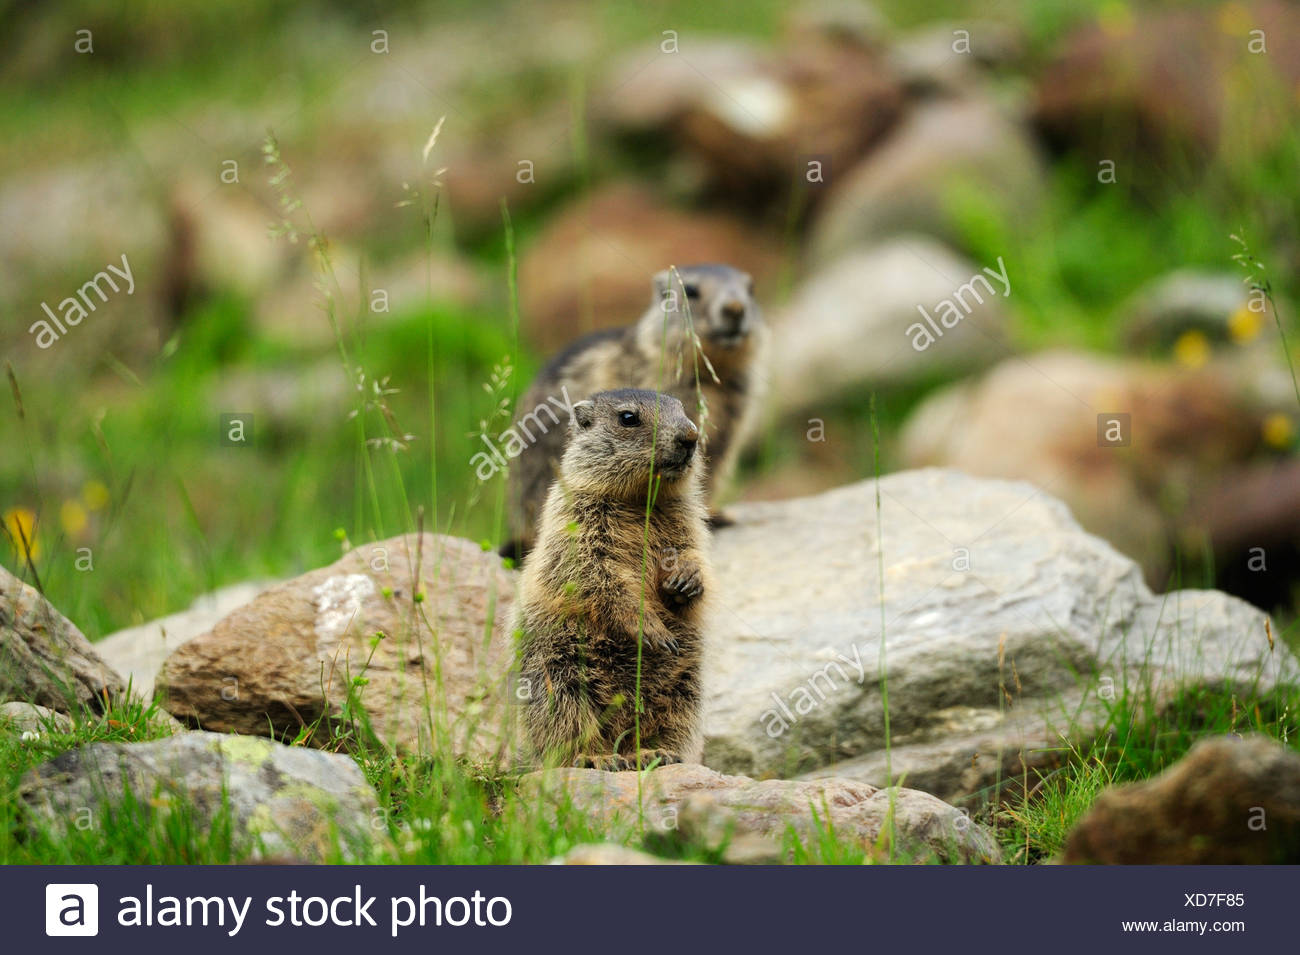 Two Alpine marmots (Marmota marmota), Stubai, Stubai Alps, Tyrol, Austria - Stock Image